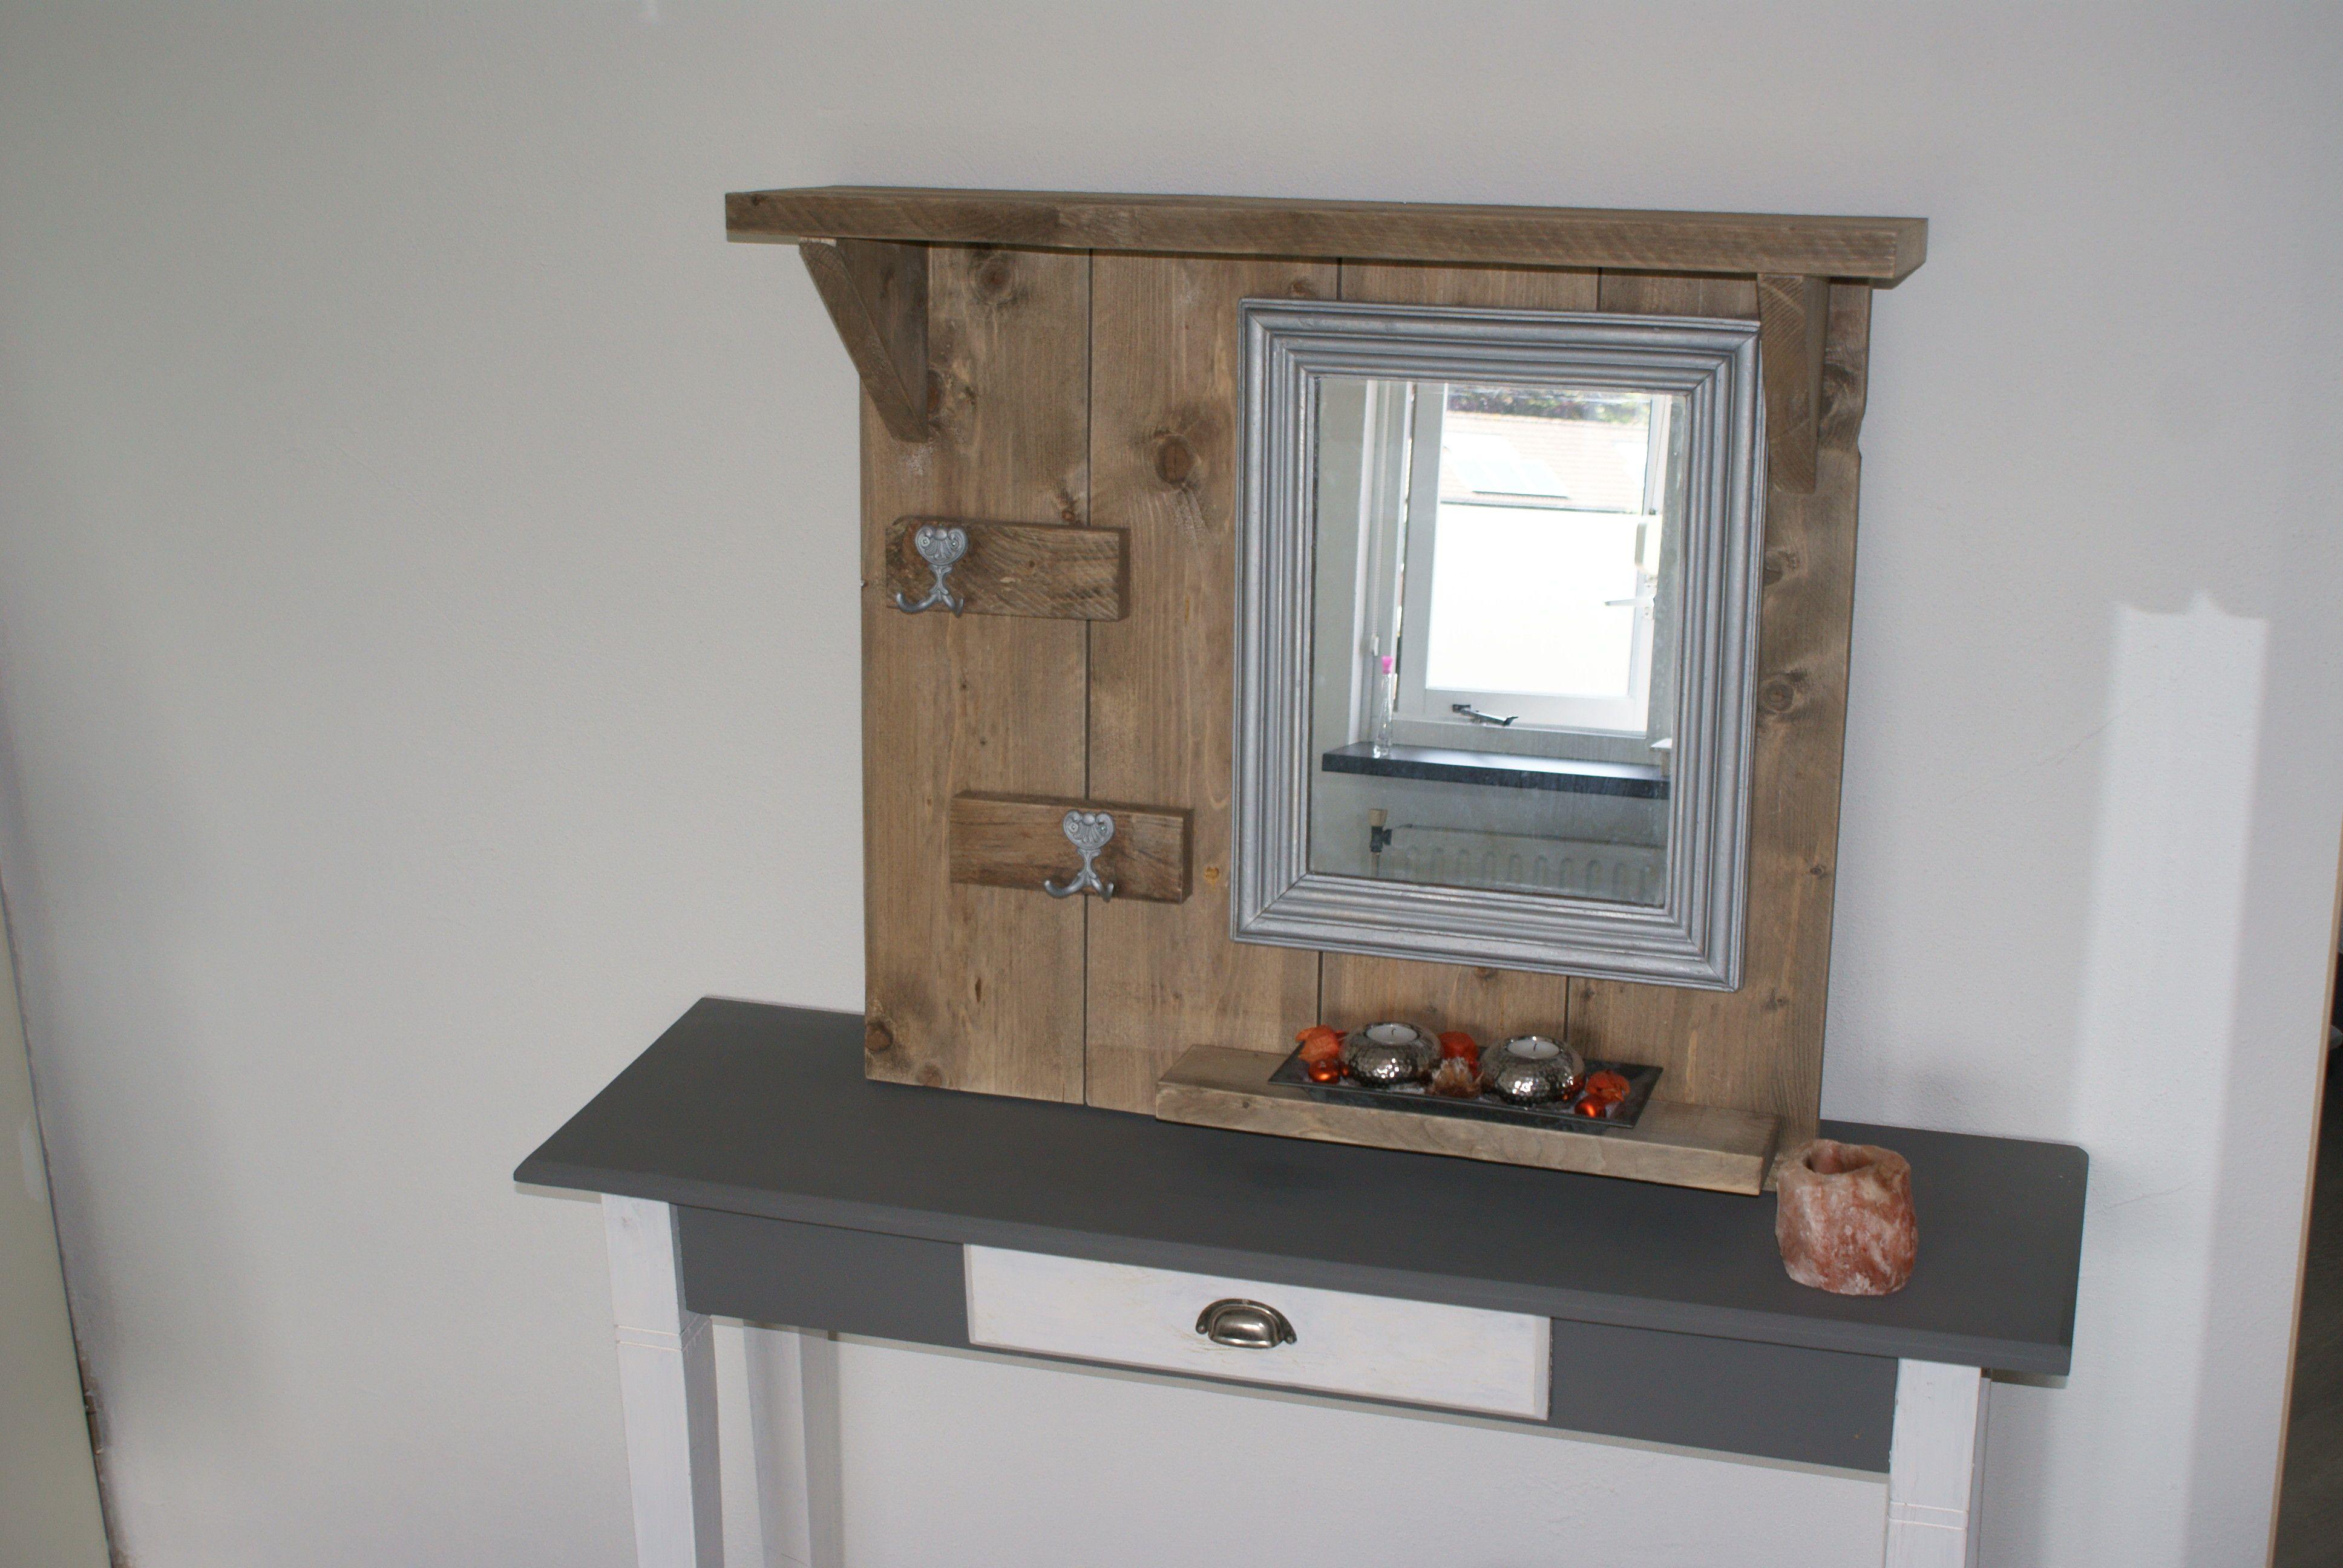 Spiegel Van Steigerhout : Wood ongeschuurde steigerhouten spiegel kunstspiegel